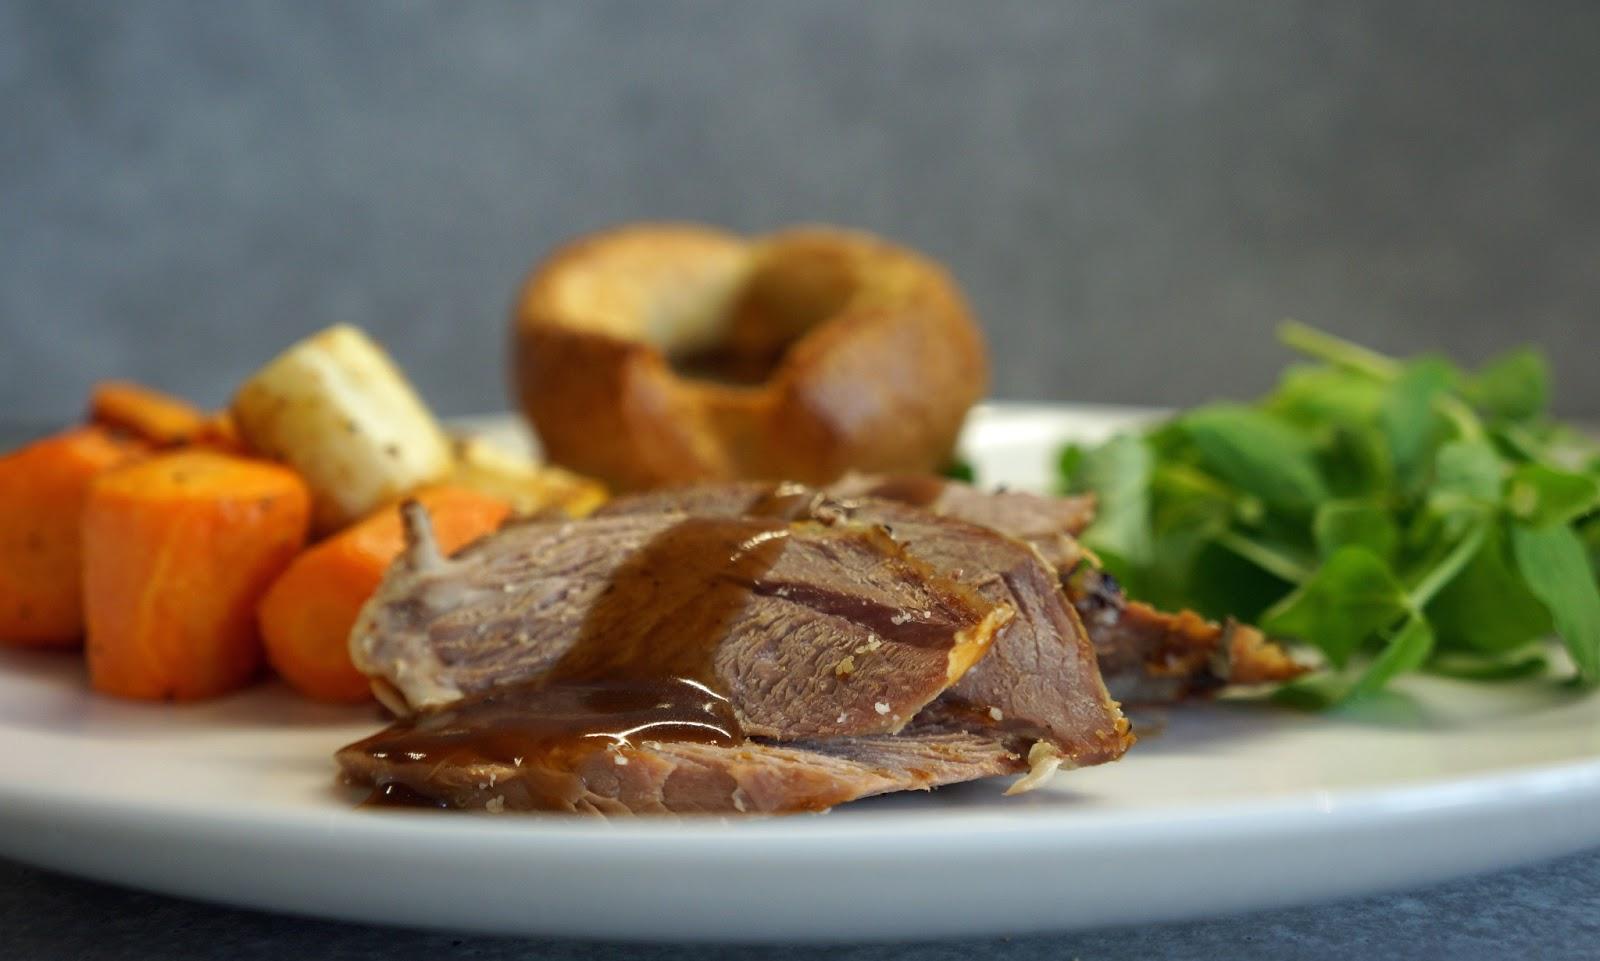 Roast+Leg+of+Lamb+with+Rosemary,+Garlic,+Pea+Sprouts,+Roast+Veg ...